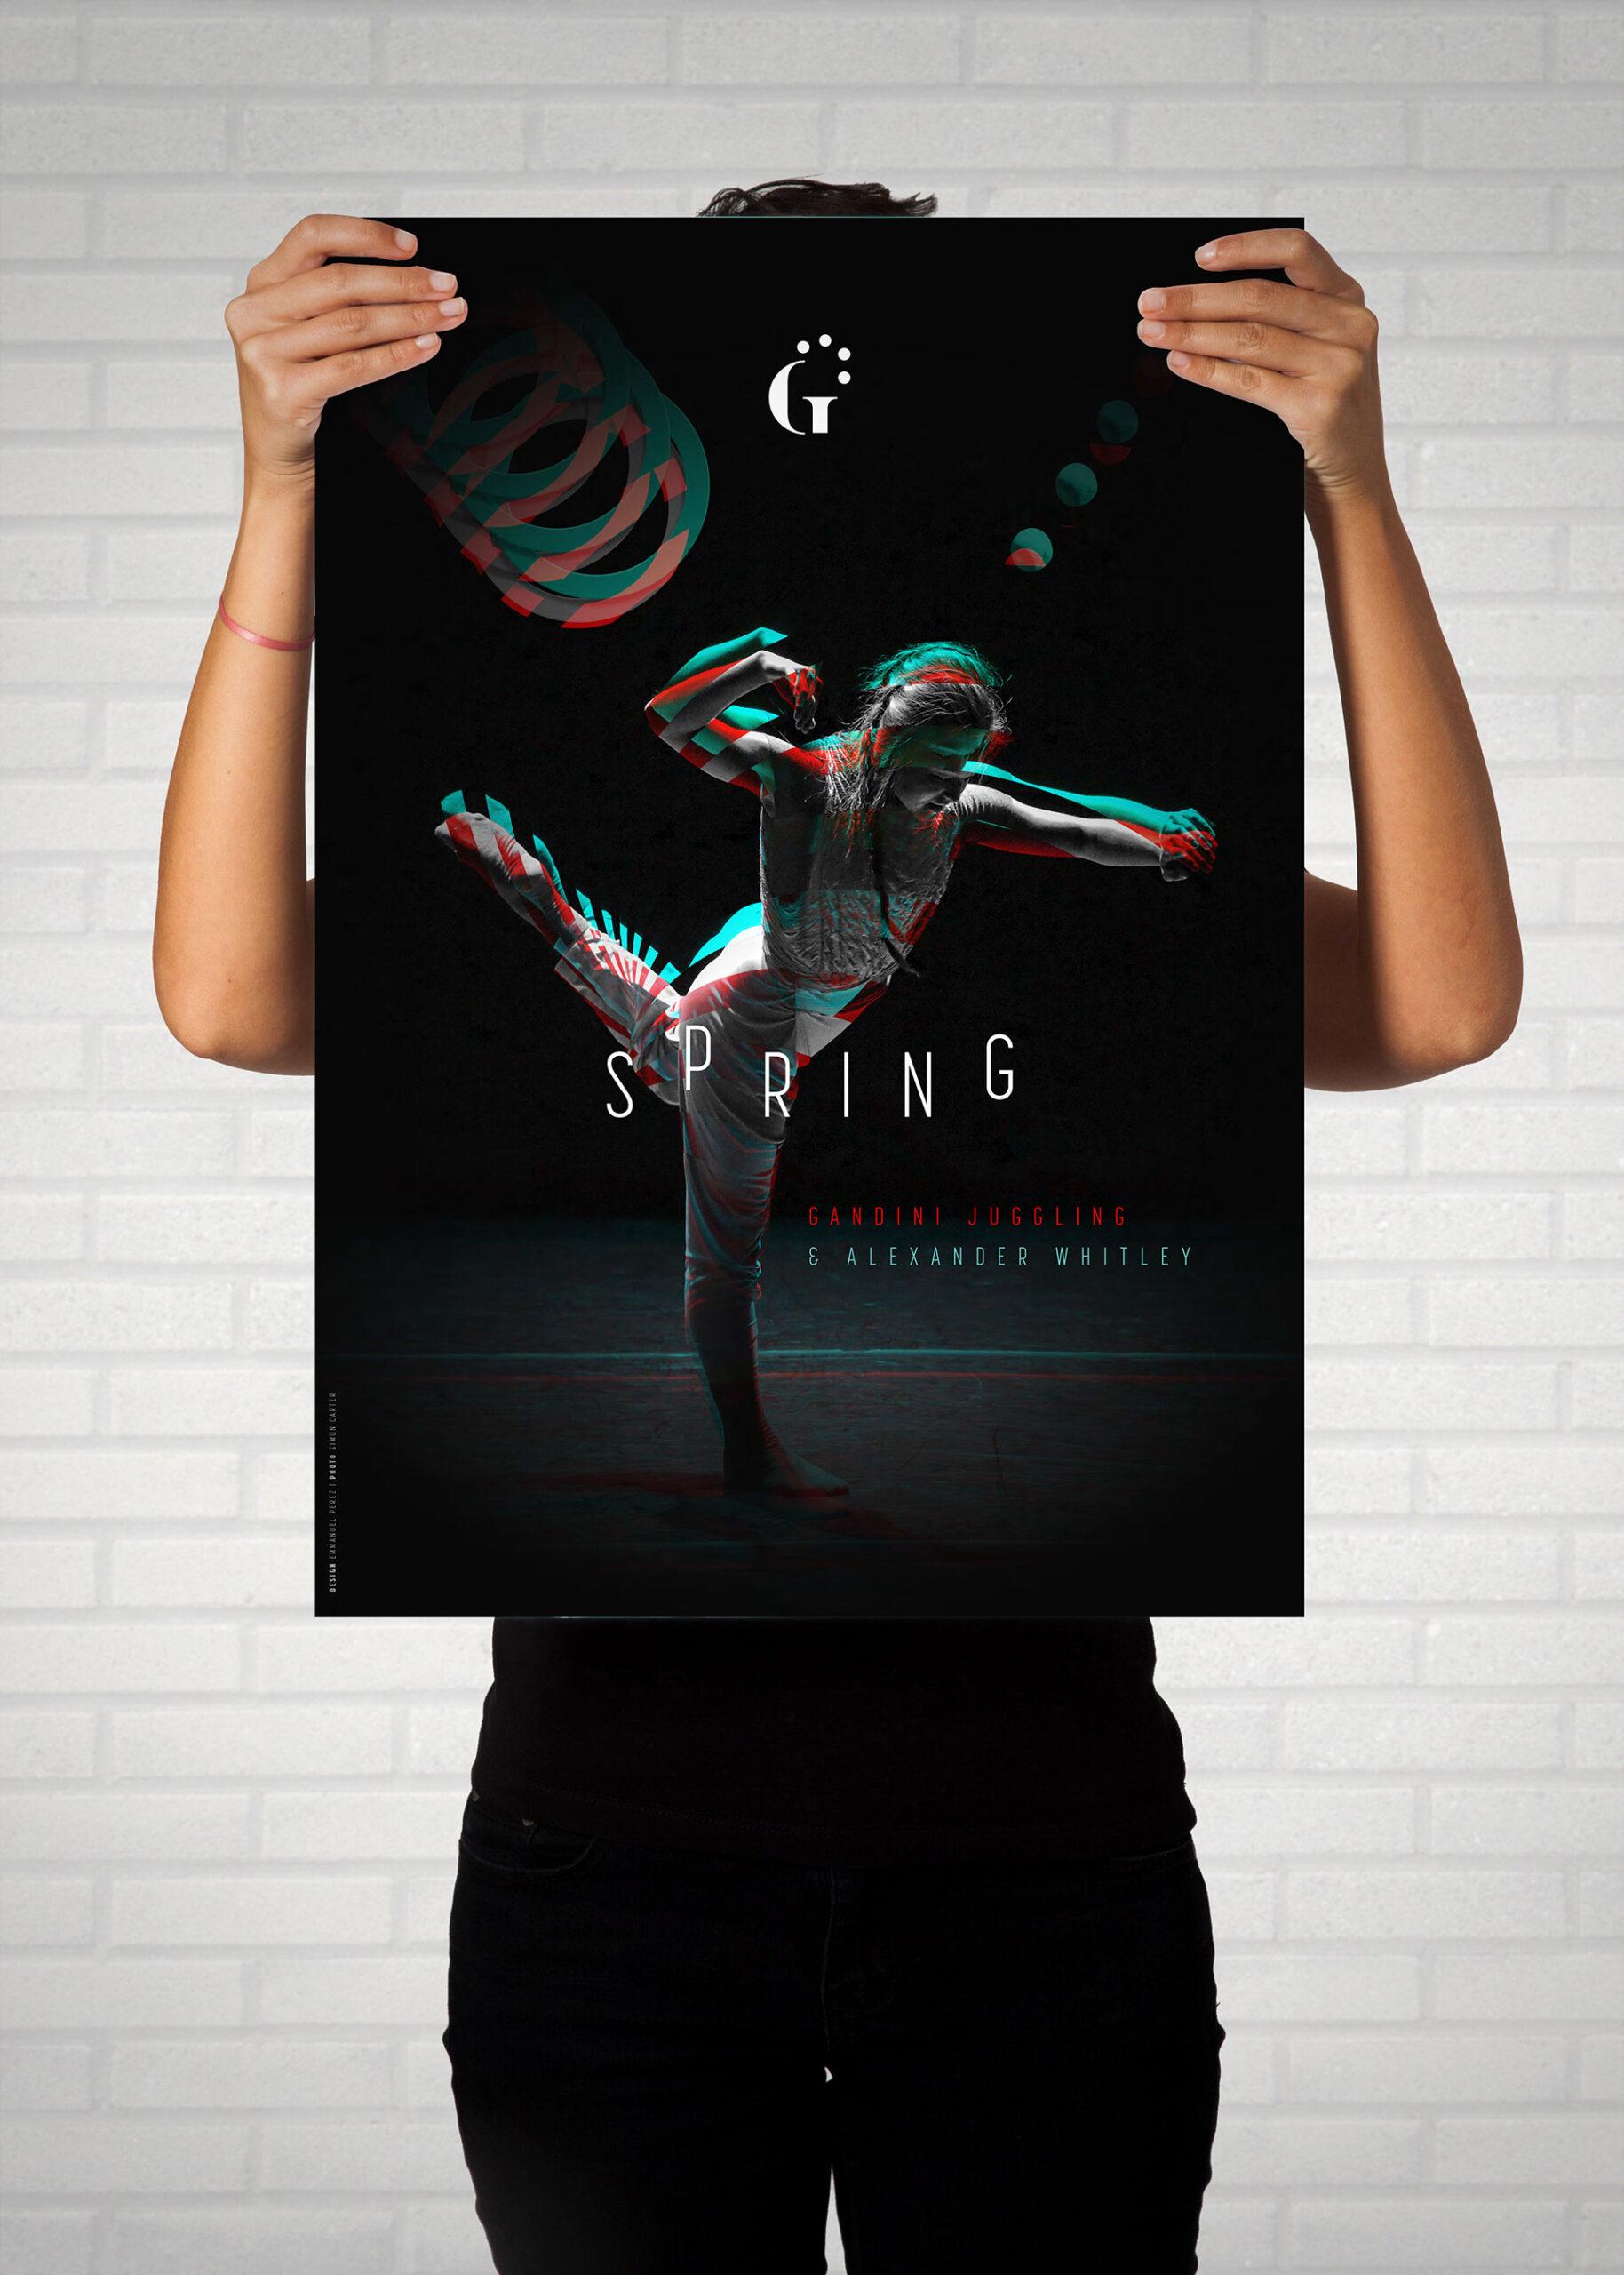 Affiche Spring Gandini-Juggling-cmondada-00